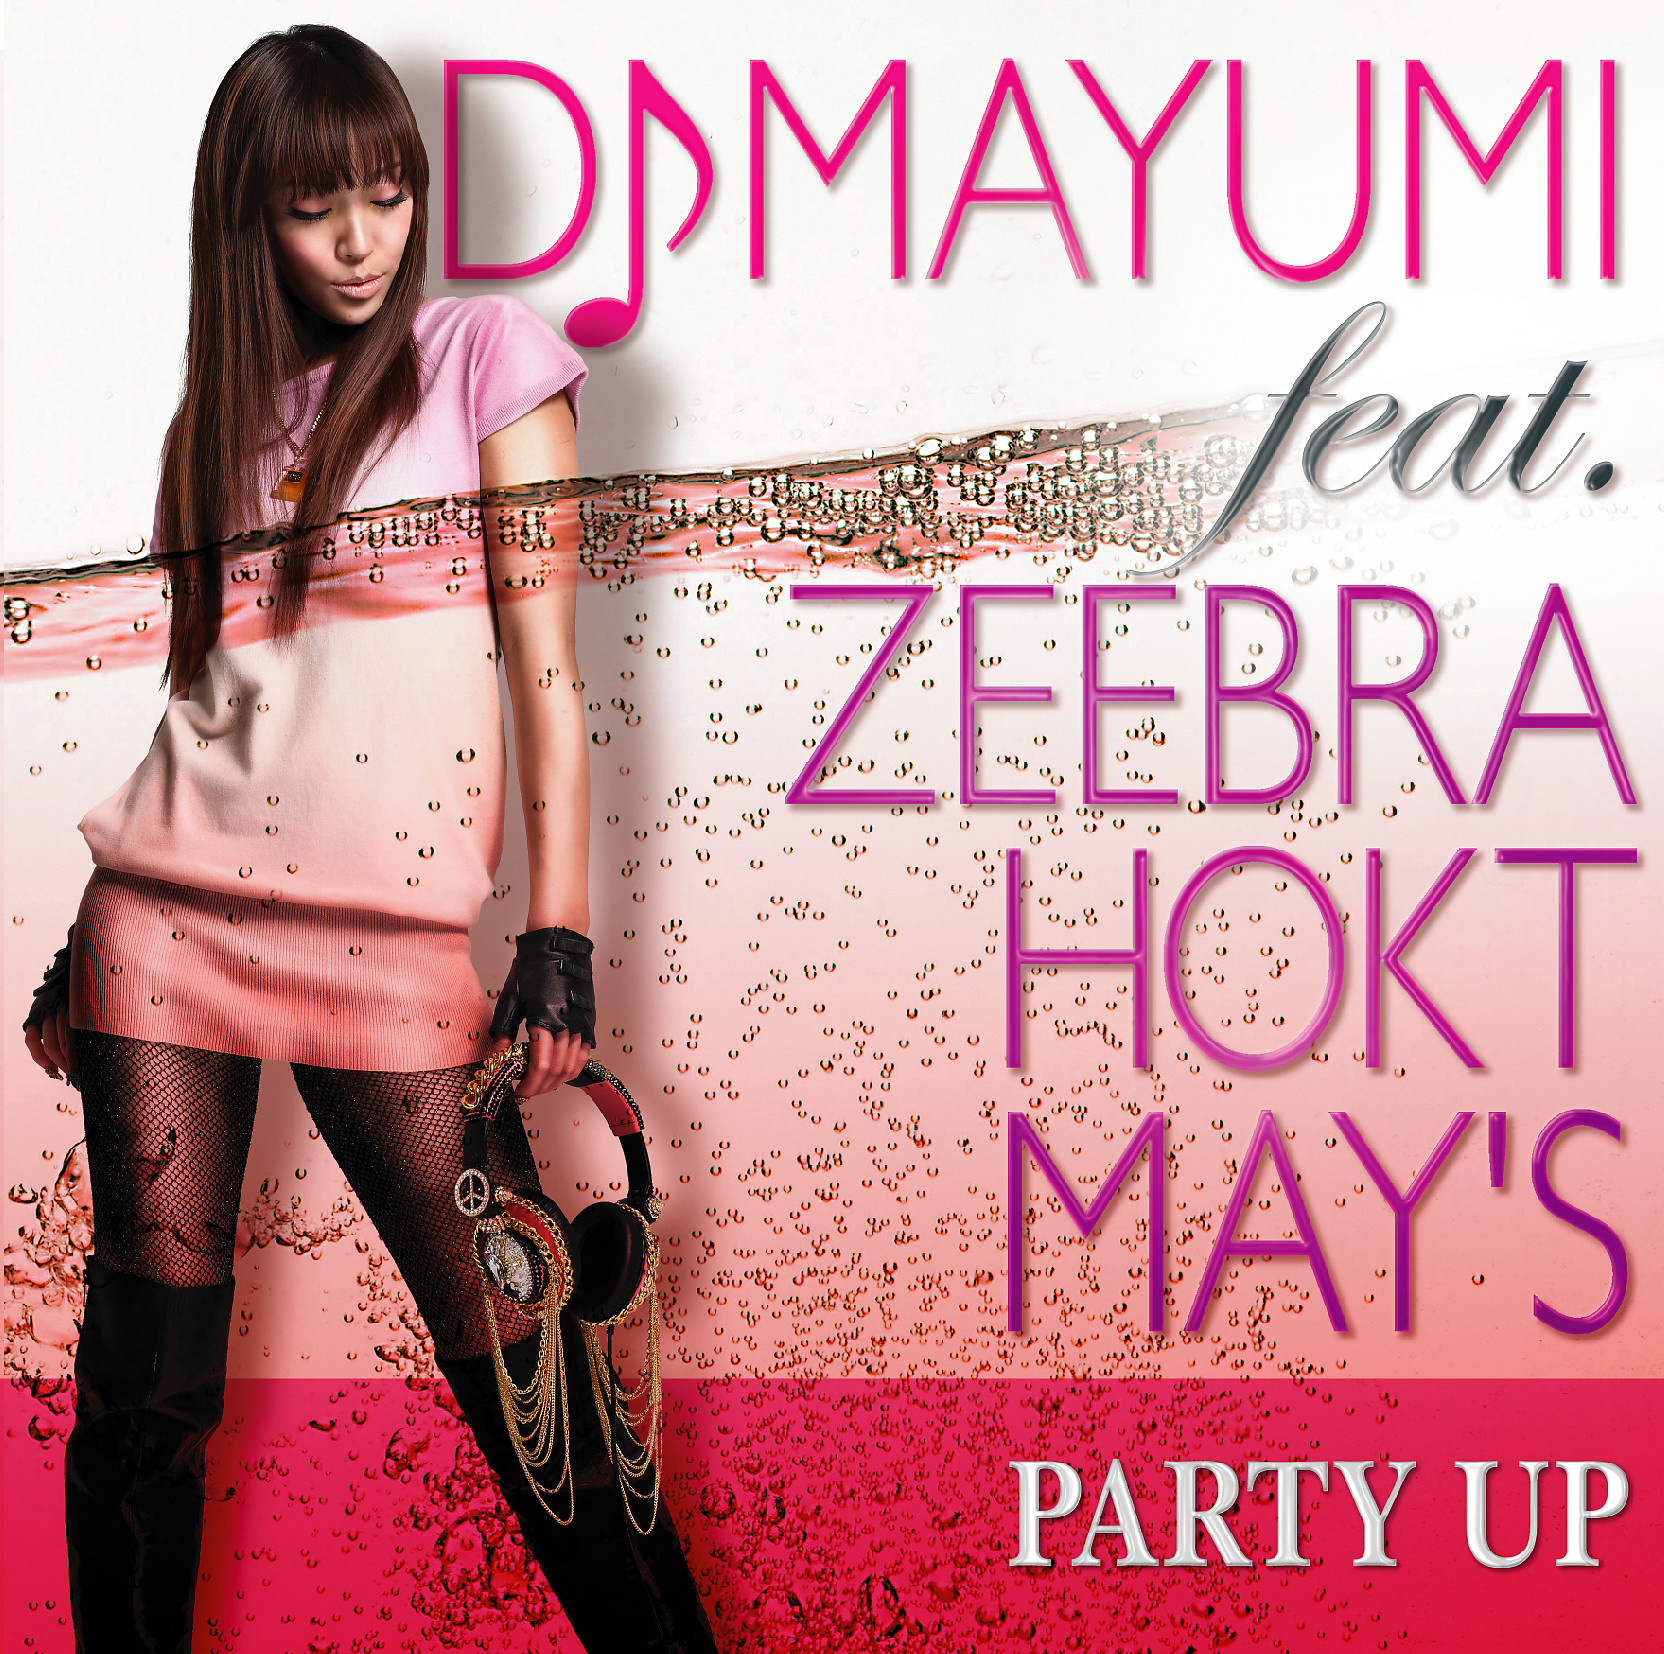 DJ MAYUMIの画像 p1_32